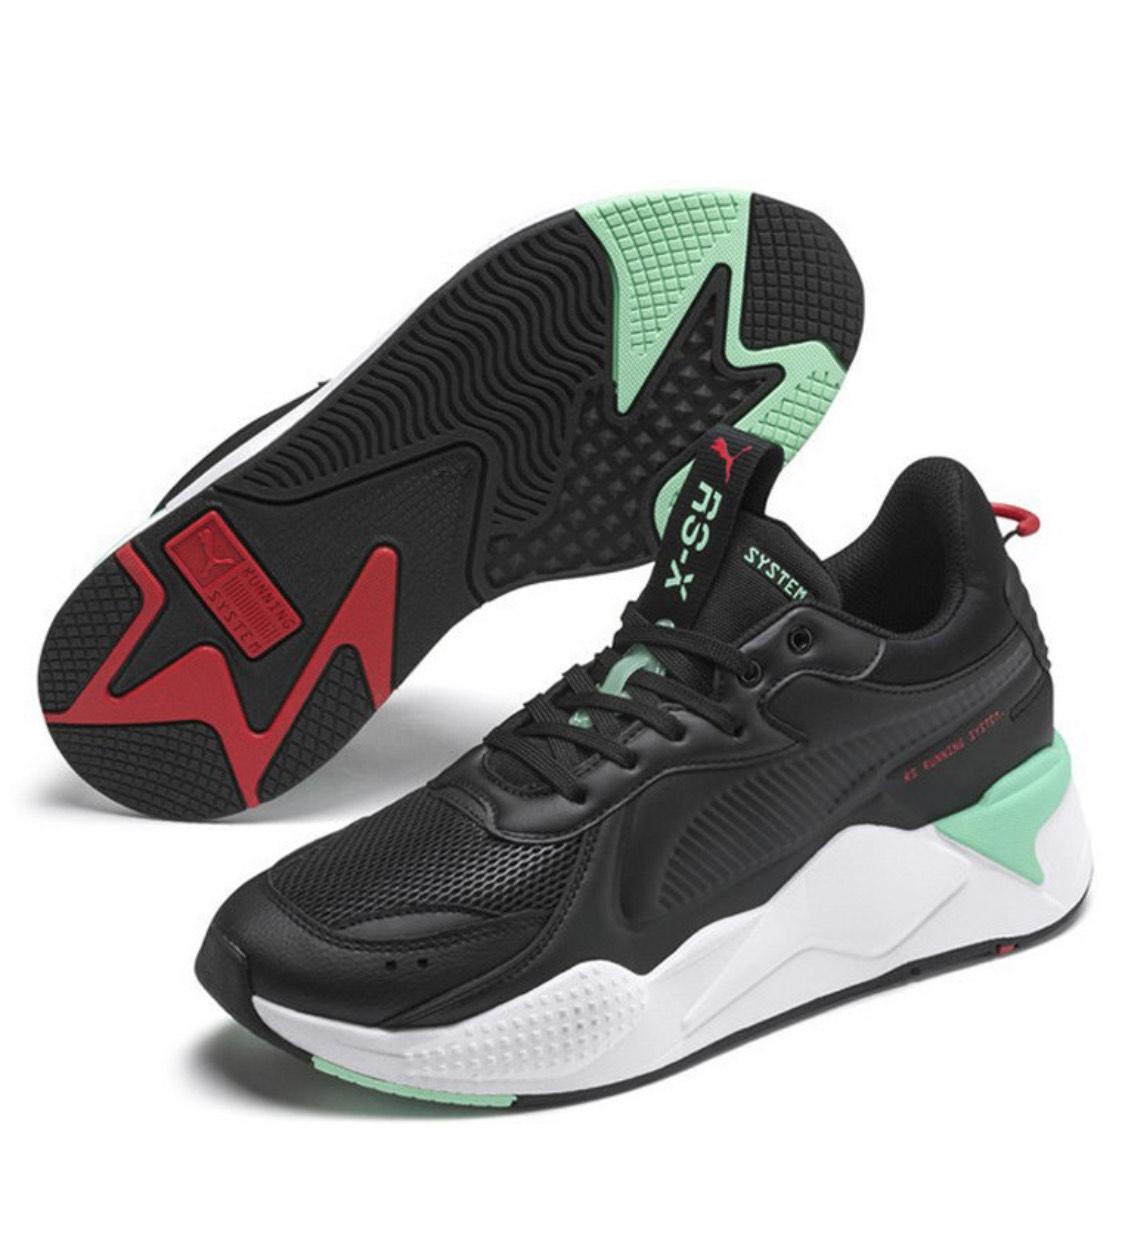 Baskets Puma RS-X Master - Tailles au choix